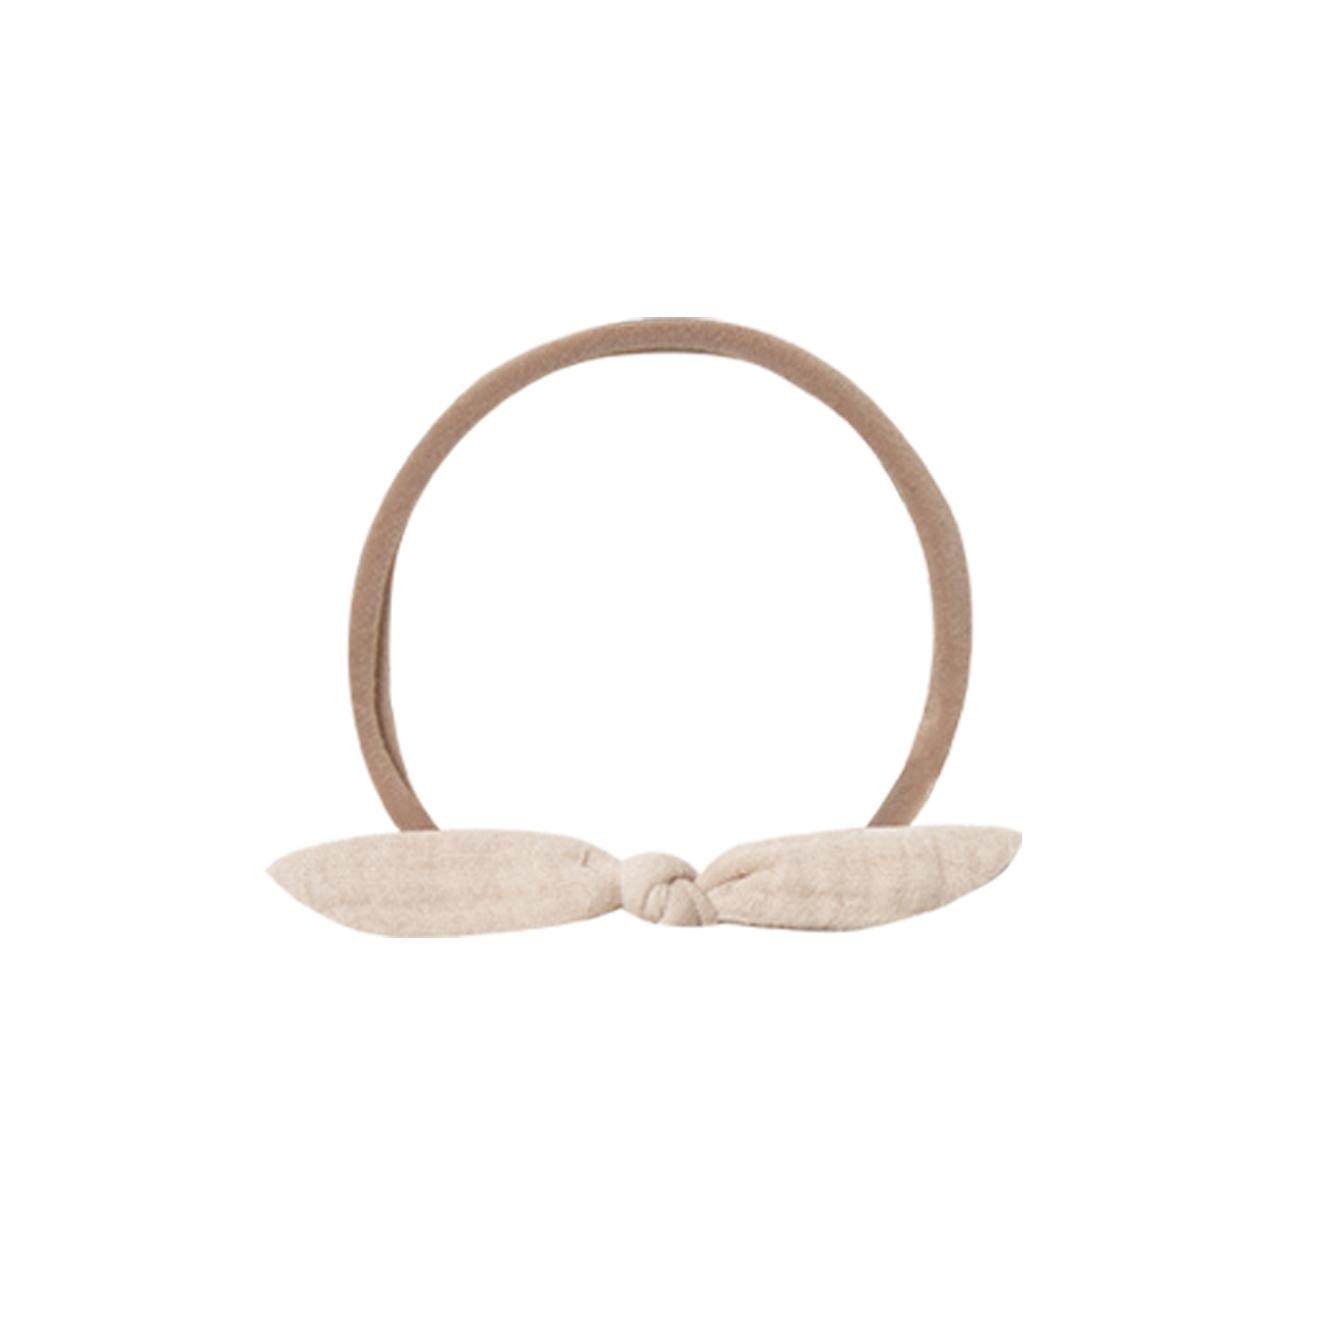 QUINCY MAE      Little Knot Headband / pebble